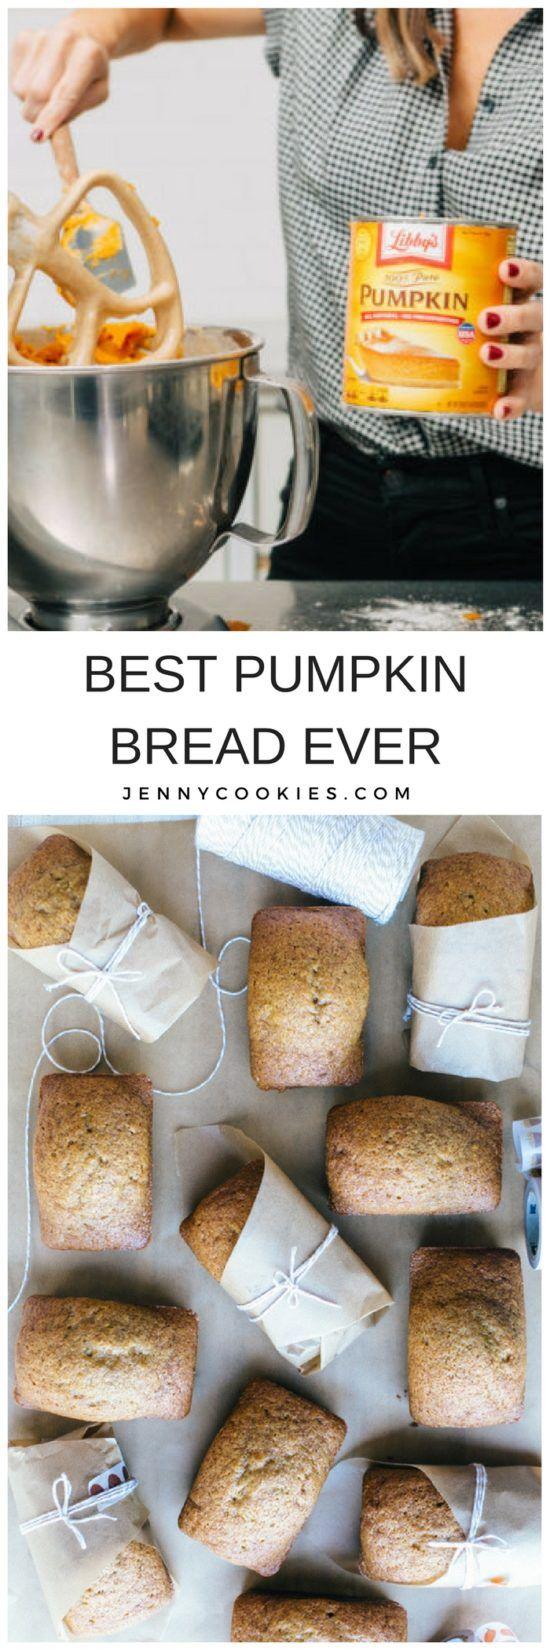 The BEST PUMPKIN BREAD EVER. | homemade pumpkin bread recipes | fall recipe ideas | pumpkin recipe ideas | ways to use pumpkin this fall | fall inspired recipes | how to make pumpkin bread | easy pumpkin bread recipes || JennyCookies.com #pumpkinbread